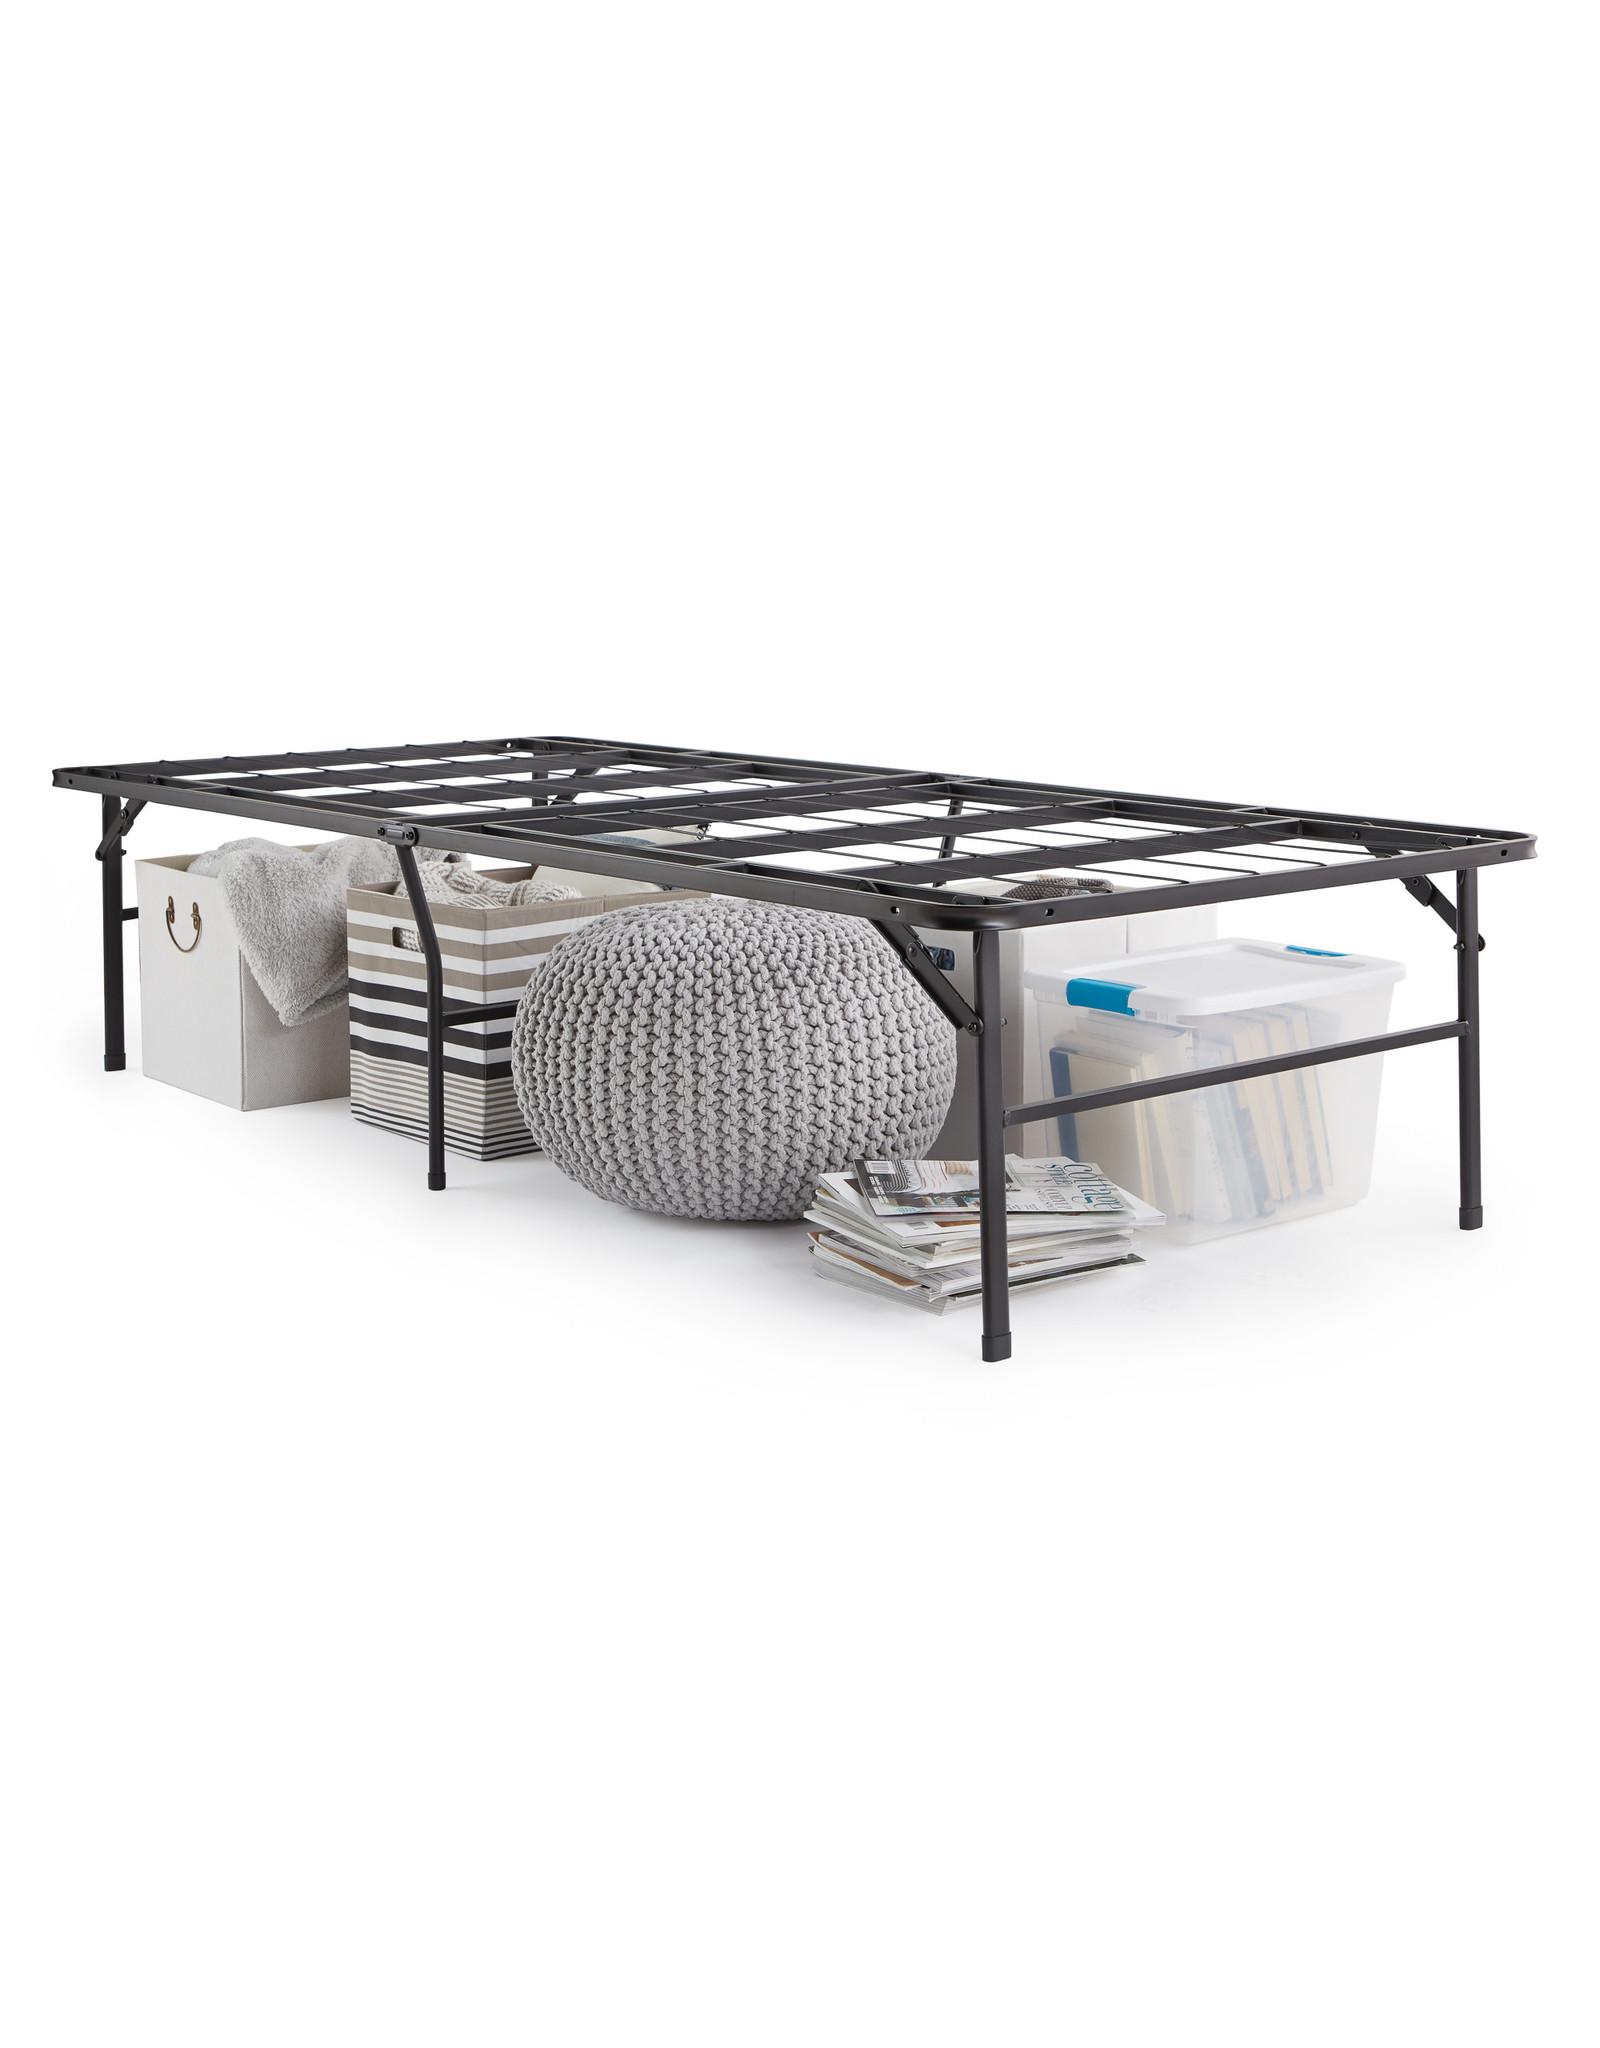 "Structures ST22KKHD 18"" Bed Frame King"